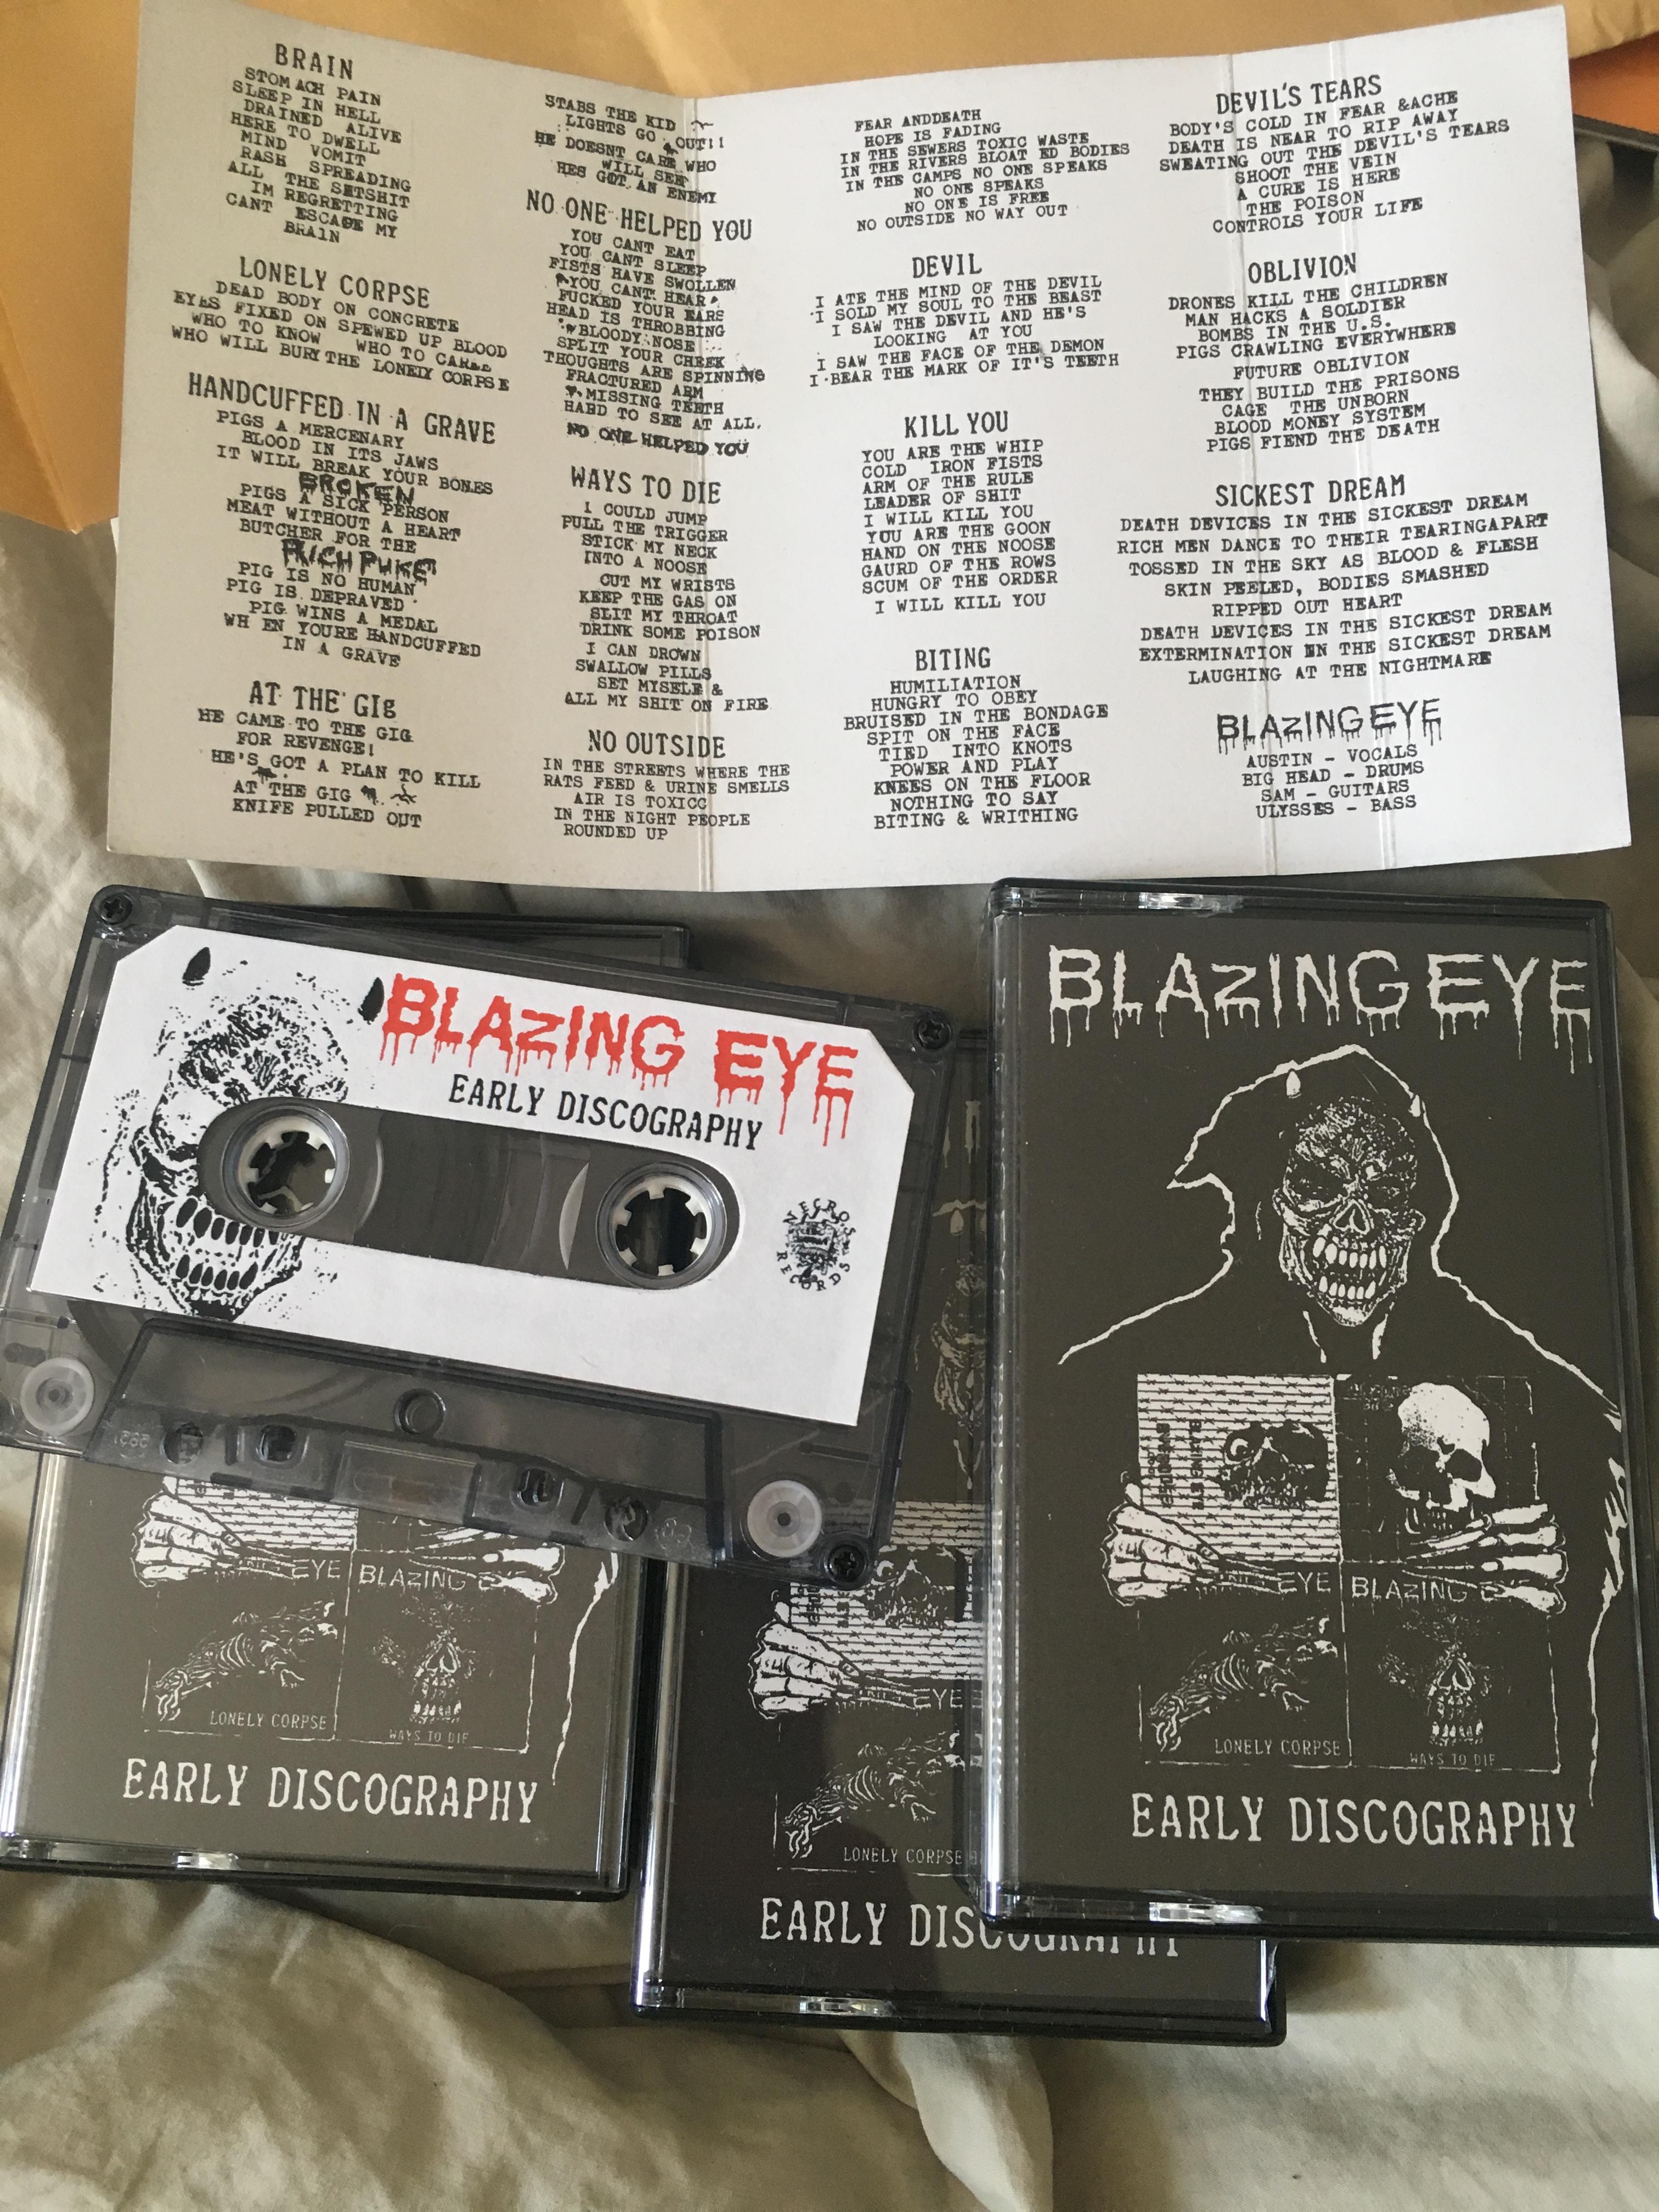 SLUGSALT RECORDS - Blazing Eye - Early Discography CS (Indonesian